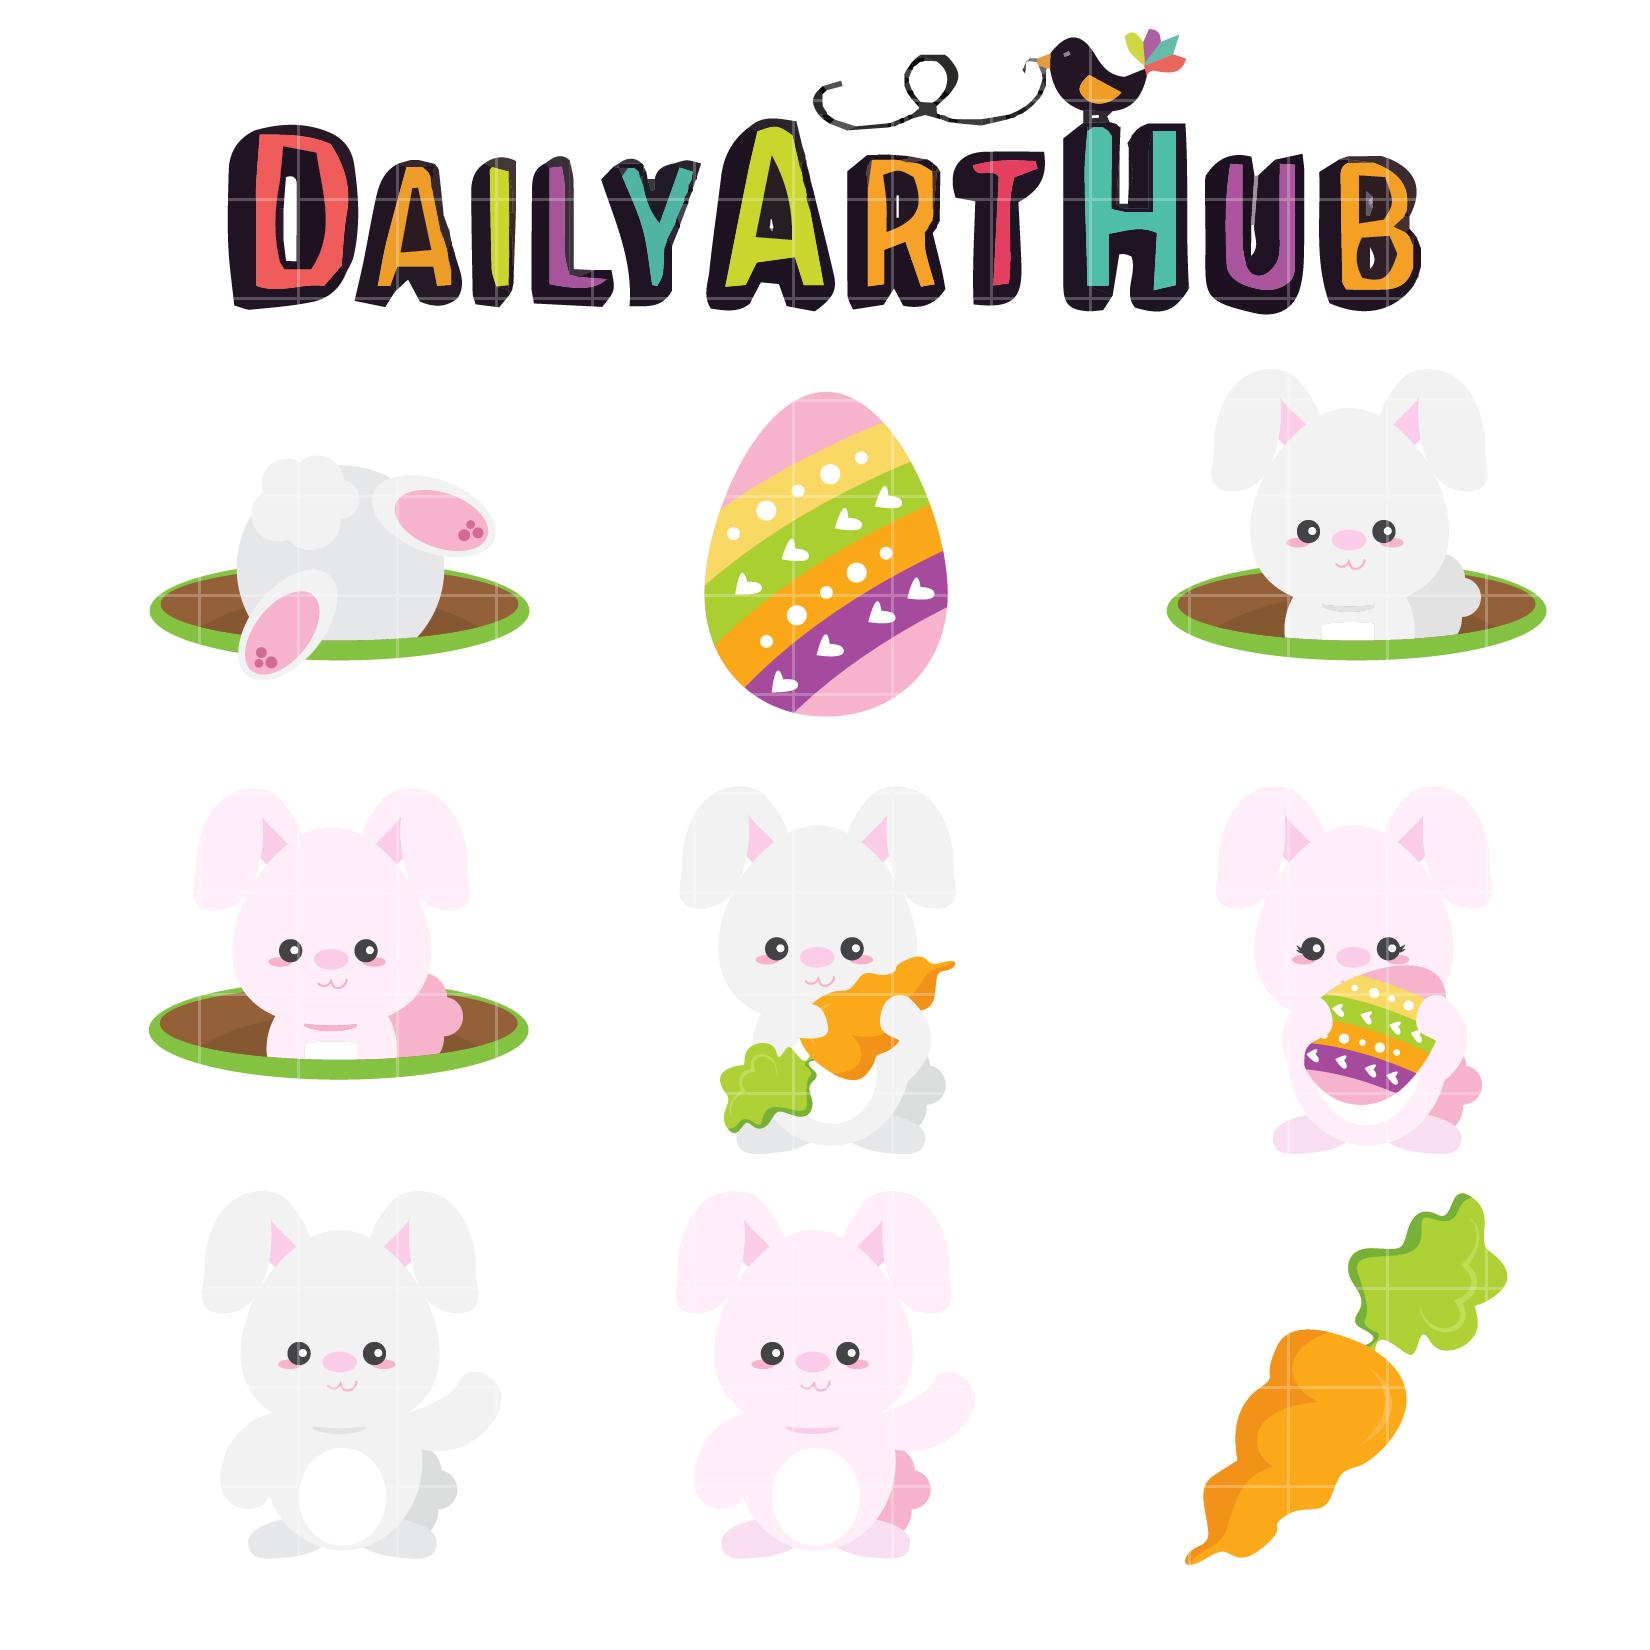 1650x1650 Cute Easter Bunny Clip Art Set Daily Art Hub